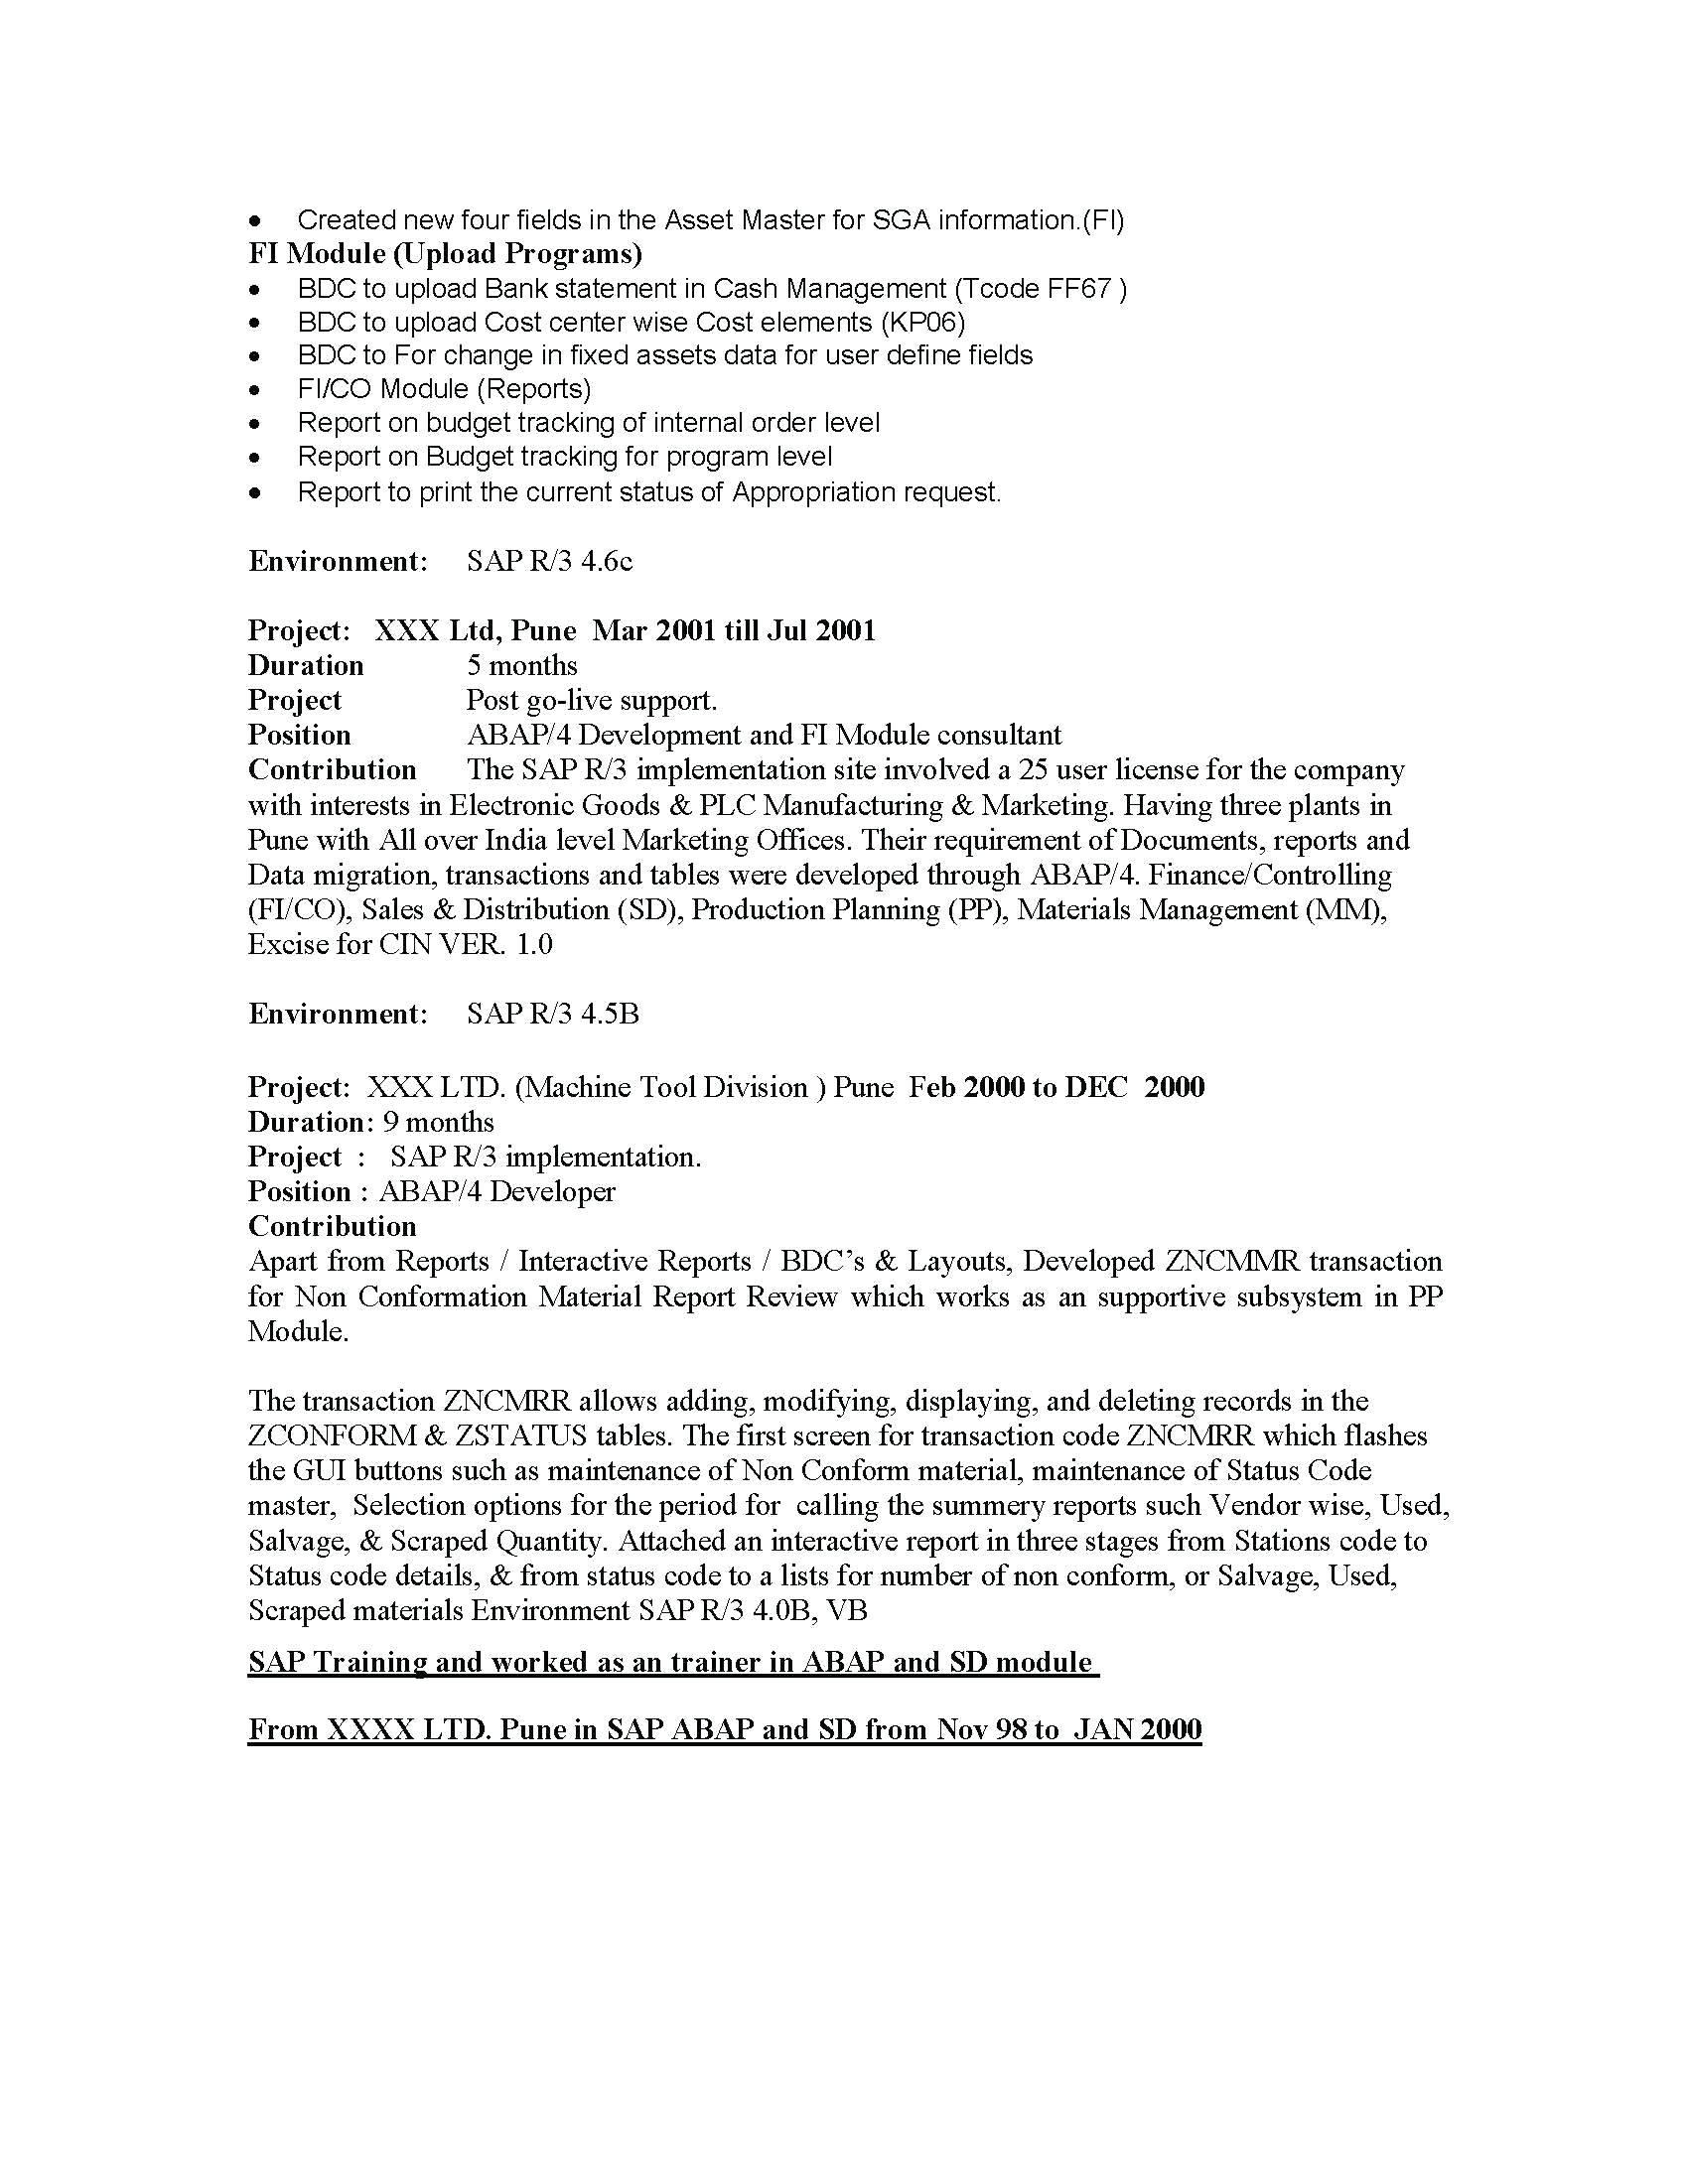 2521345312288 sap fico sample resume 3 years experience